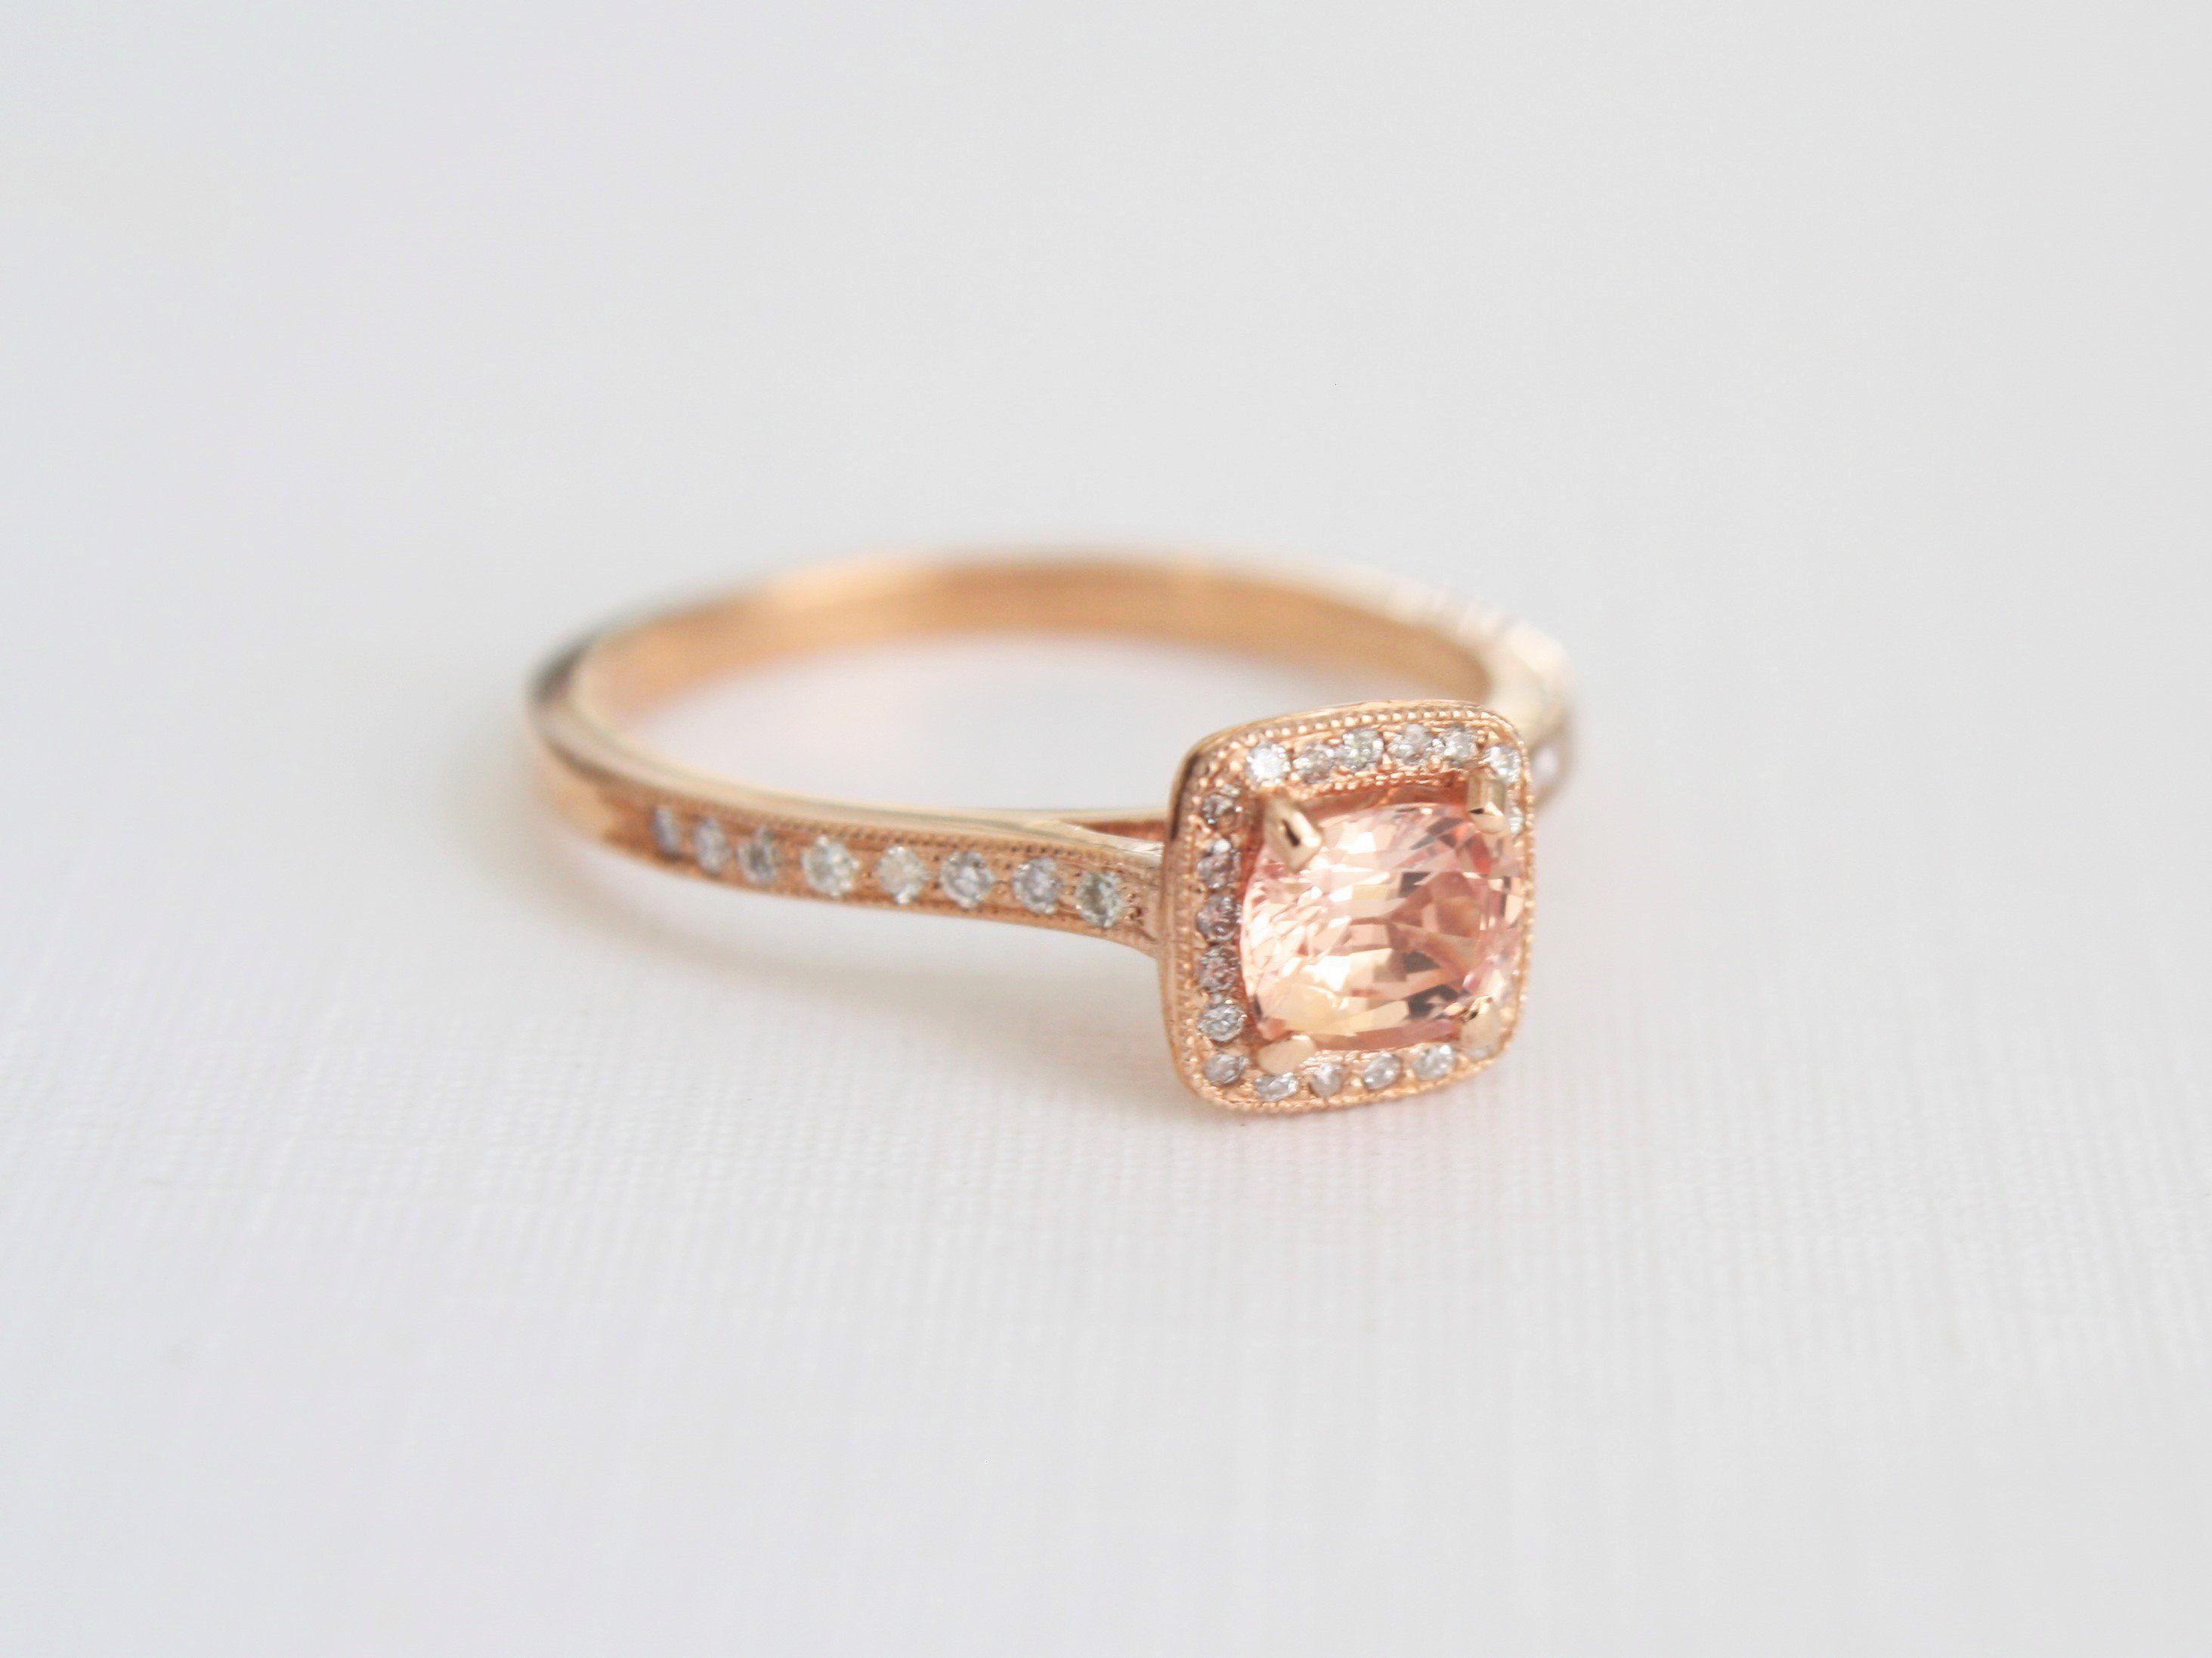 Cushion padparadscha sapphire diamond halo engagement ring in k